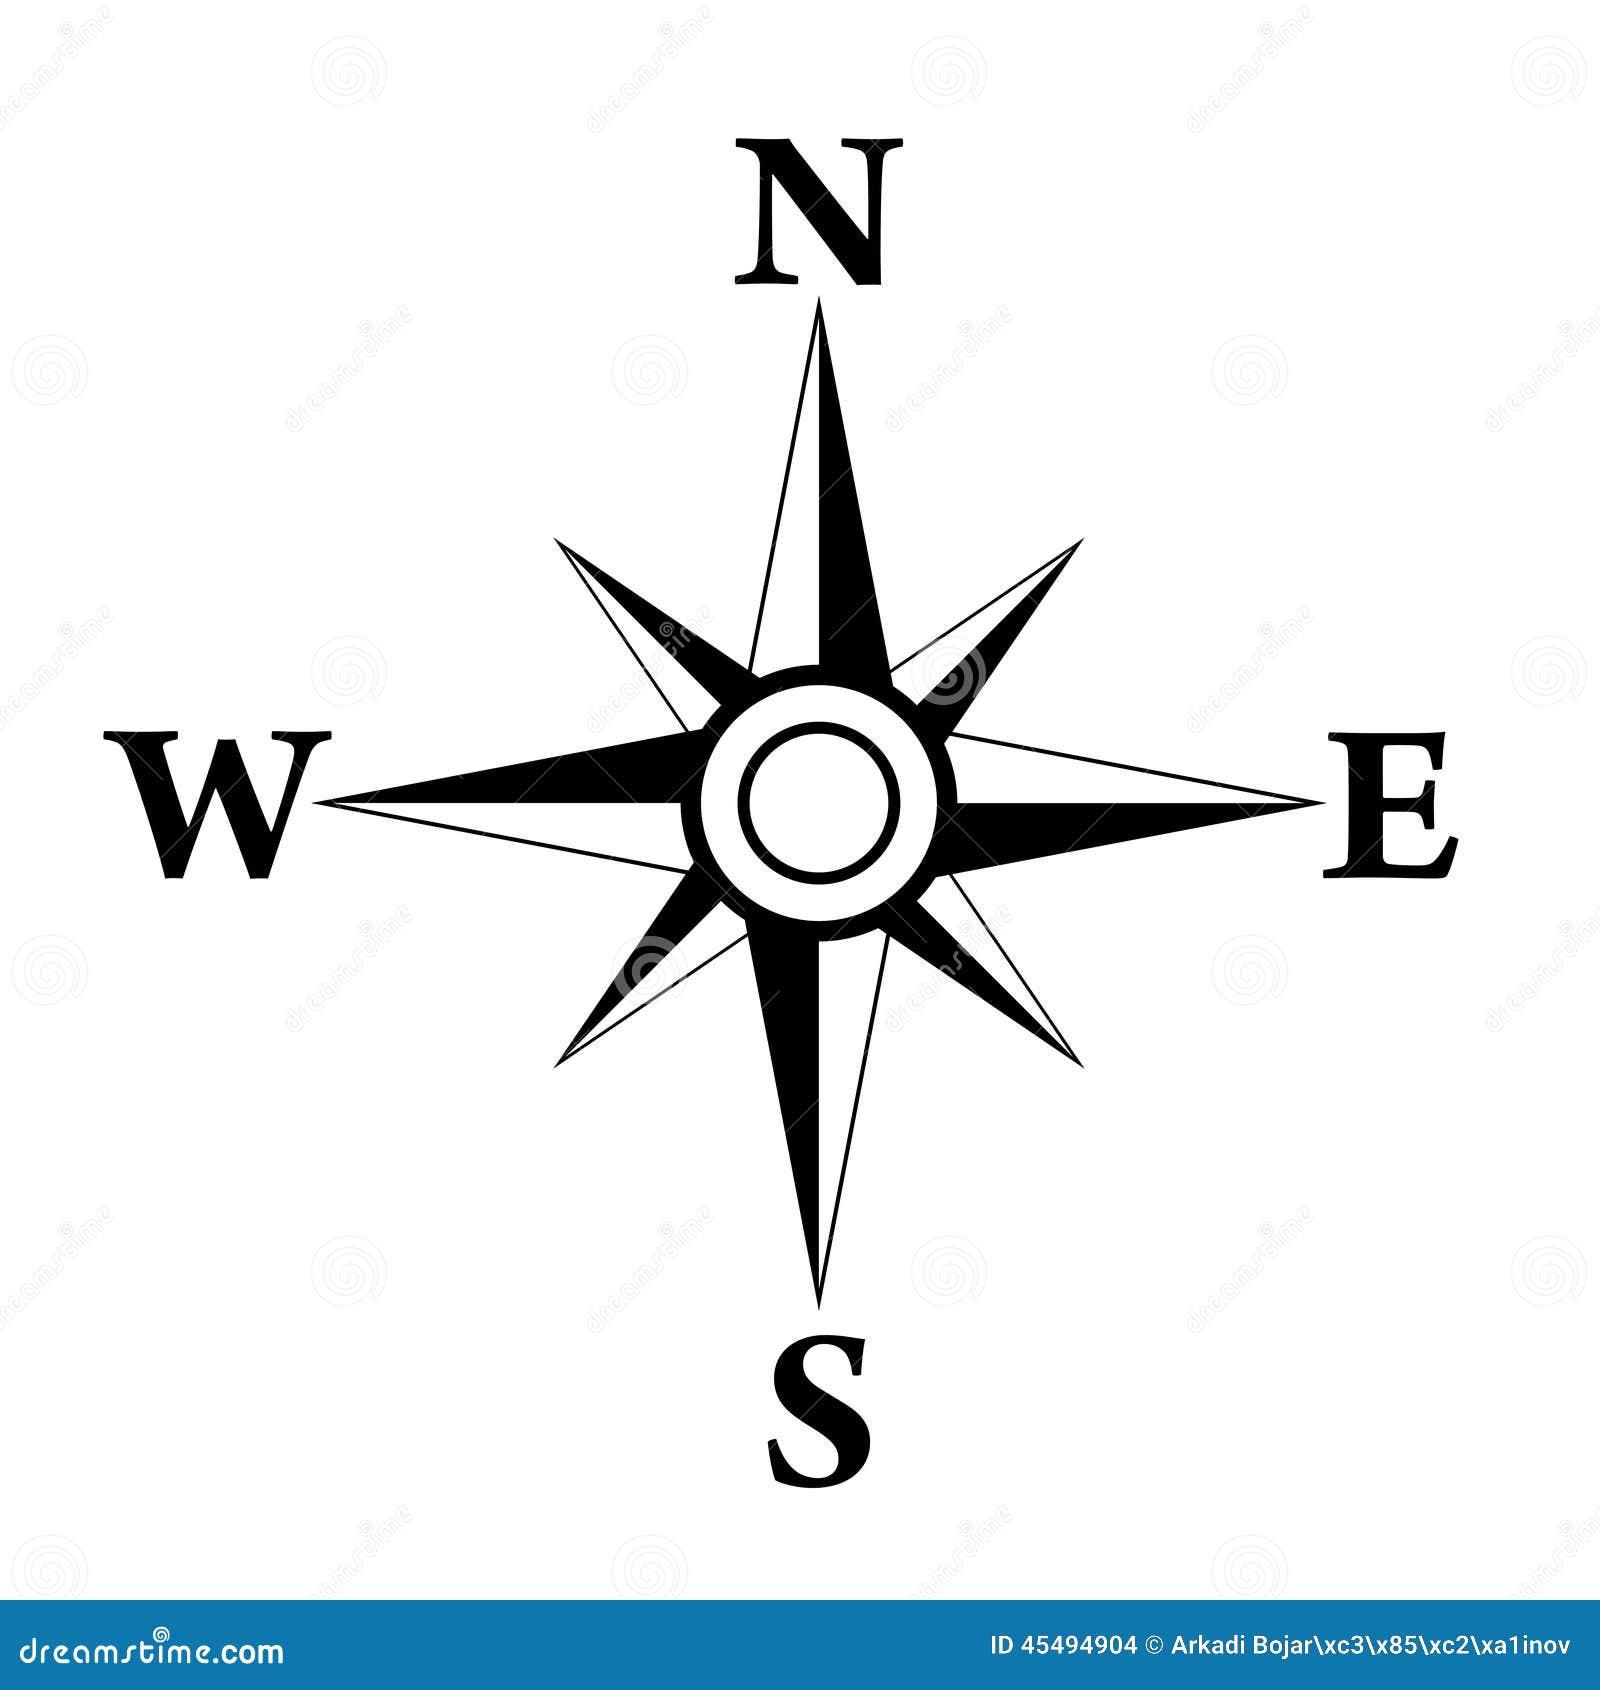 Wind rose symbol stock vector. Illustration of shape ...